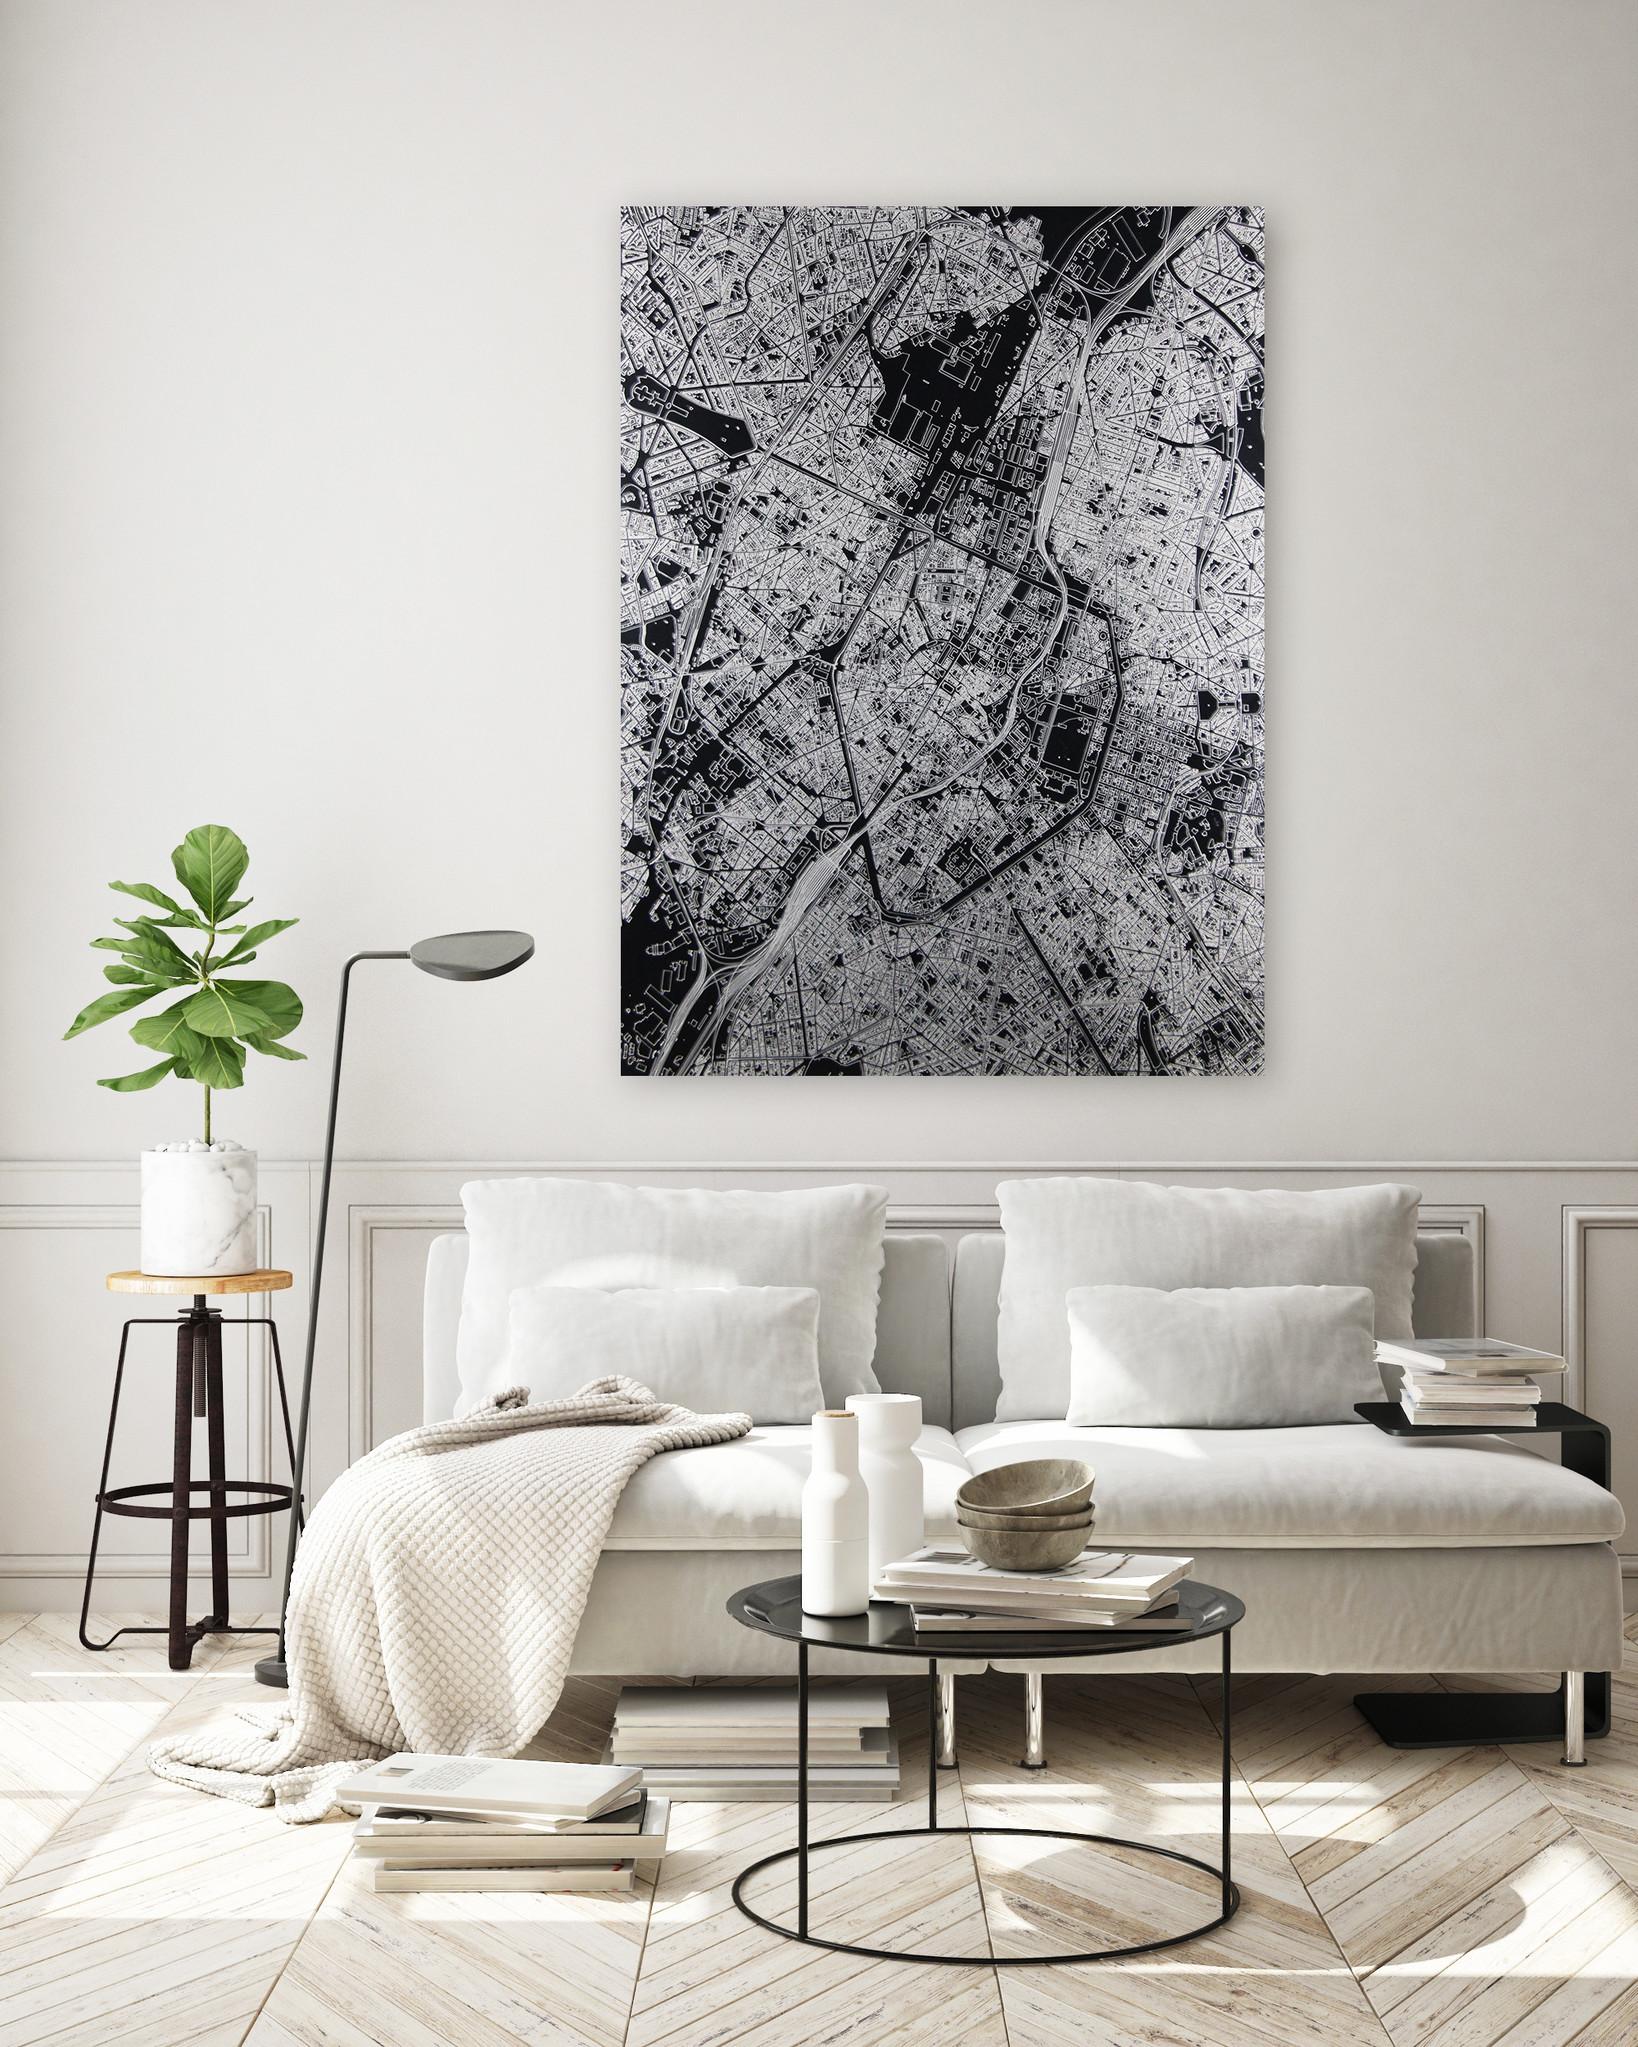 Stadtkarte Namur | Aluminium Wanddekoration-2